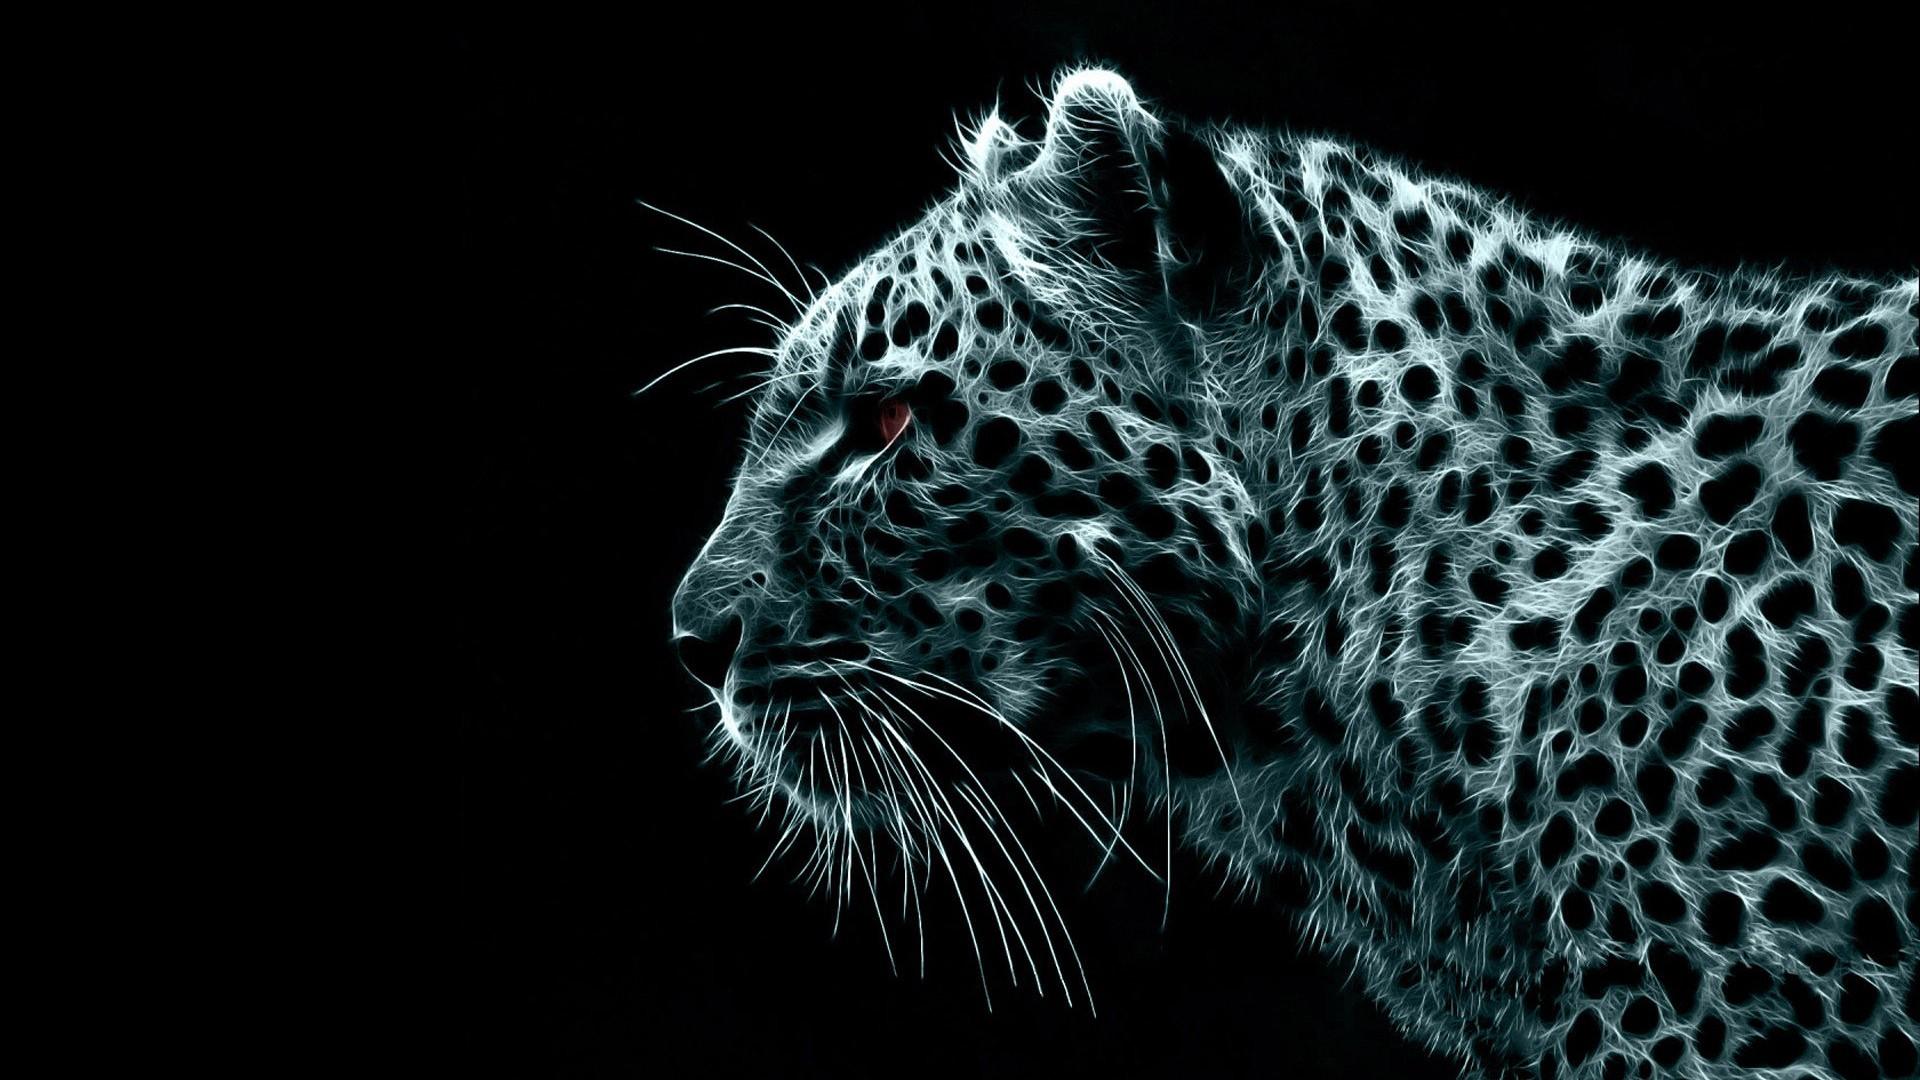 Wallpaper Leopard Desktop in high resolution for Get Wallpaper 1920x1080